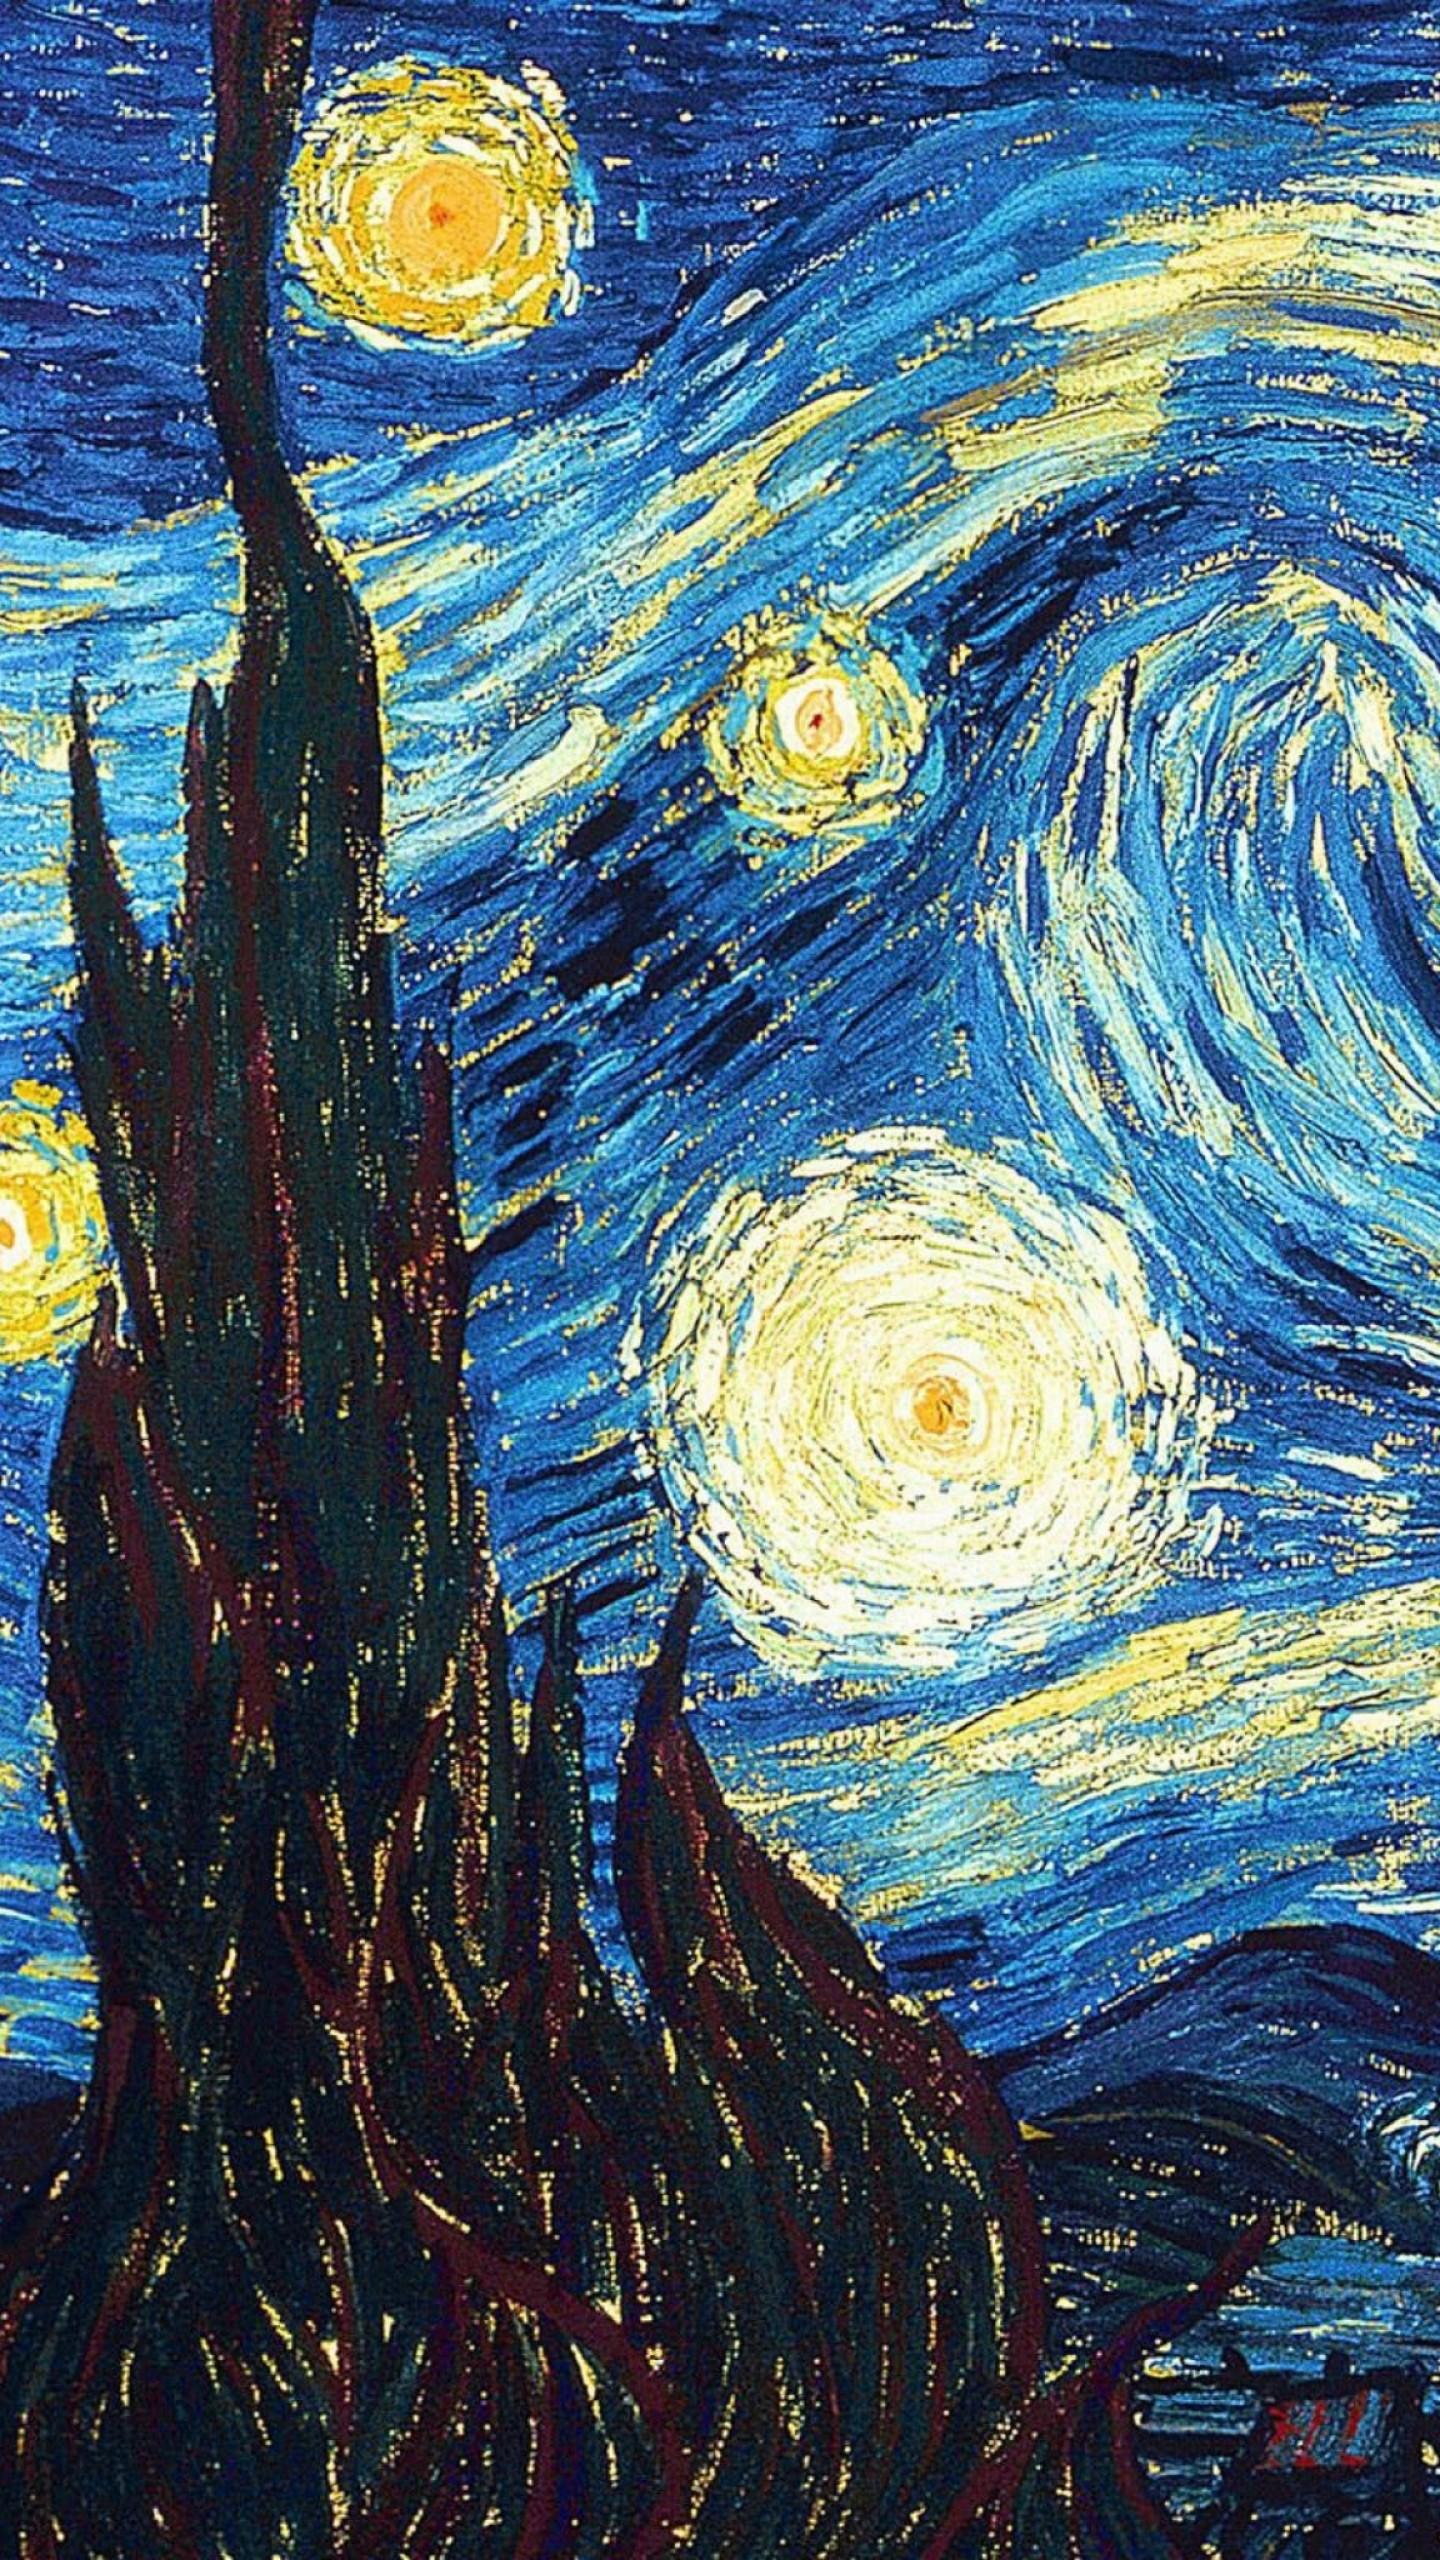 Res: 1440x2560, Batman Van Gogh Images : Resolution: , Chauncey Nealy